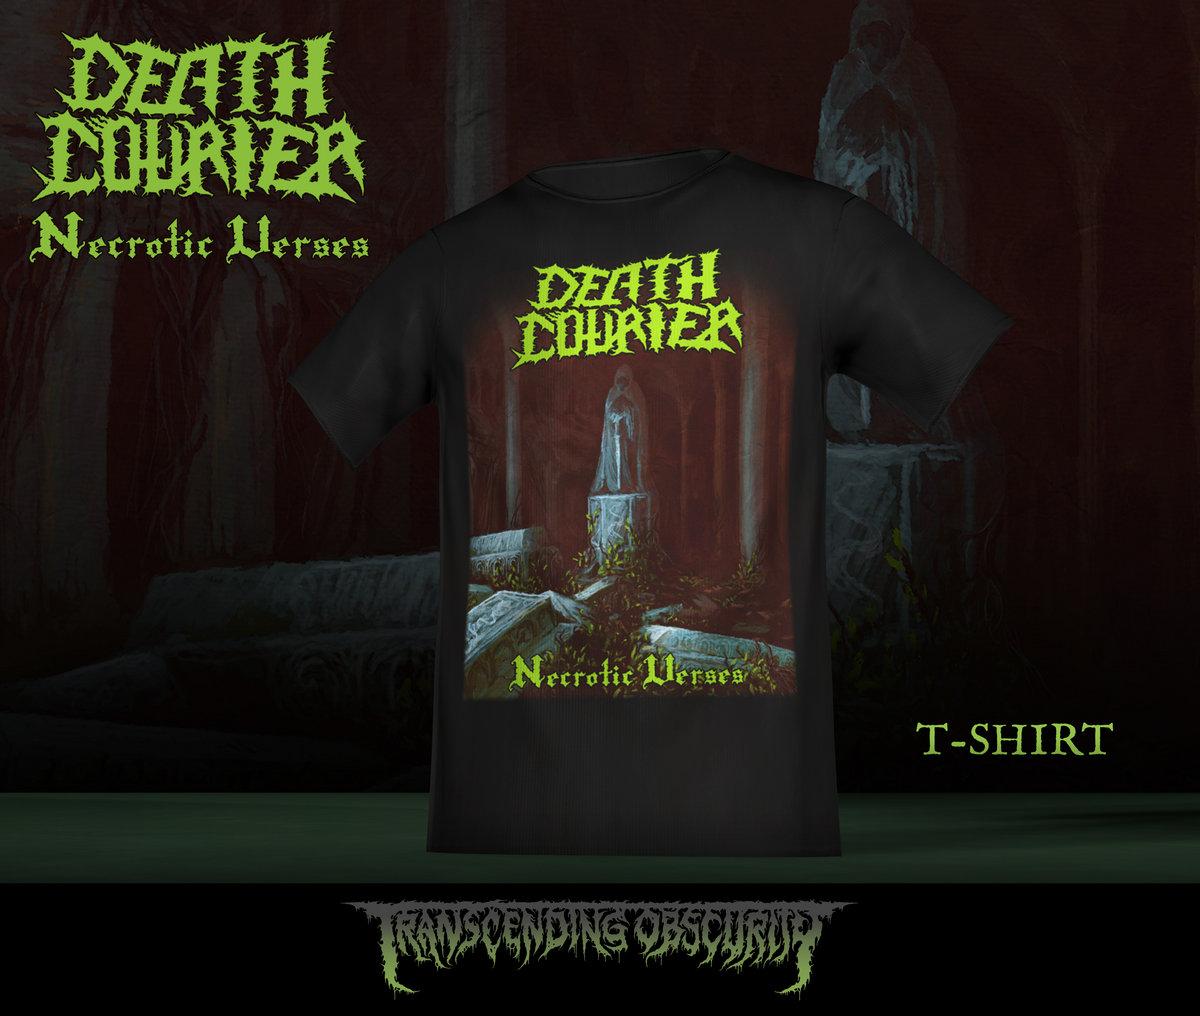 DEATH COURIER Album Artwork T-shirt (Limited to 30 nos.)